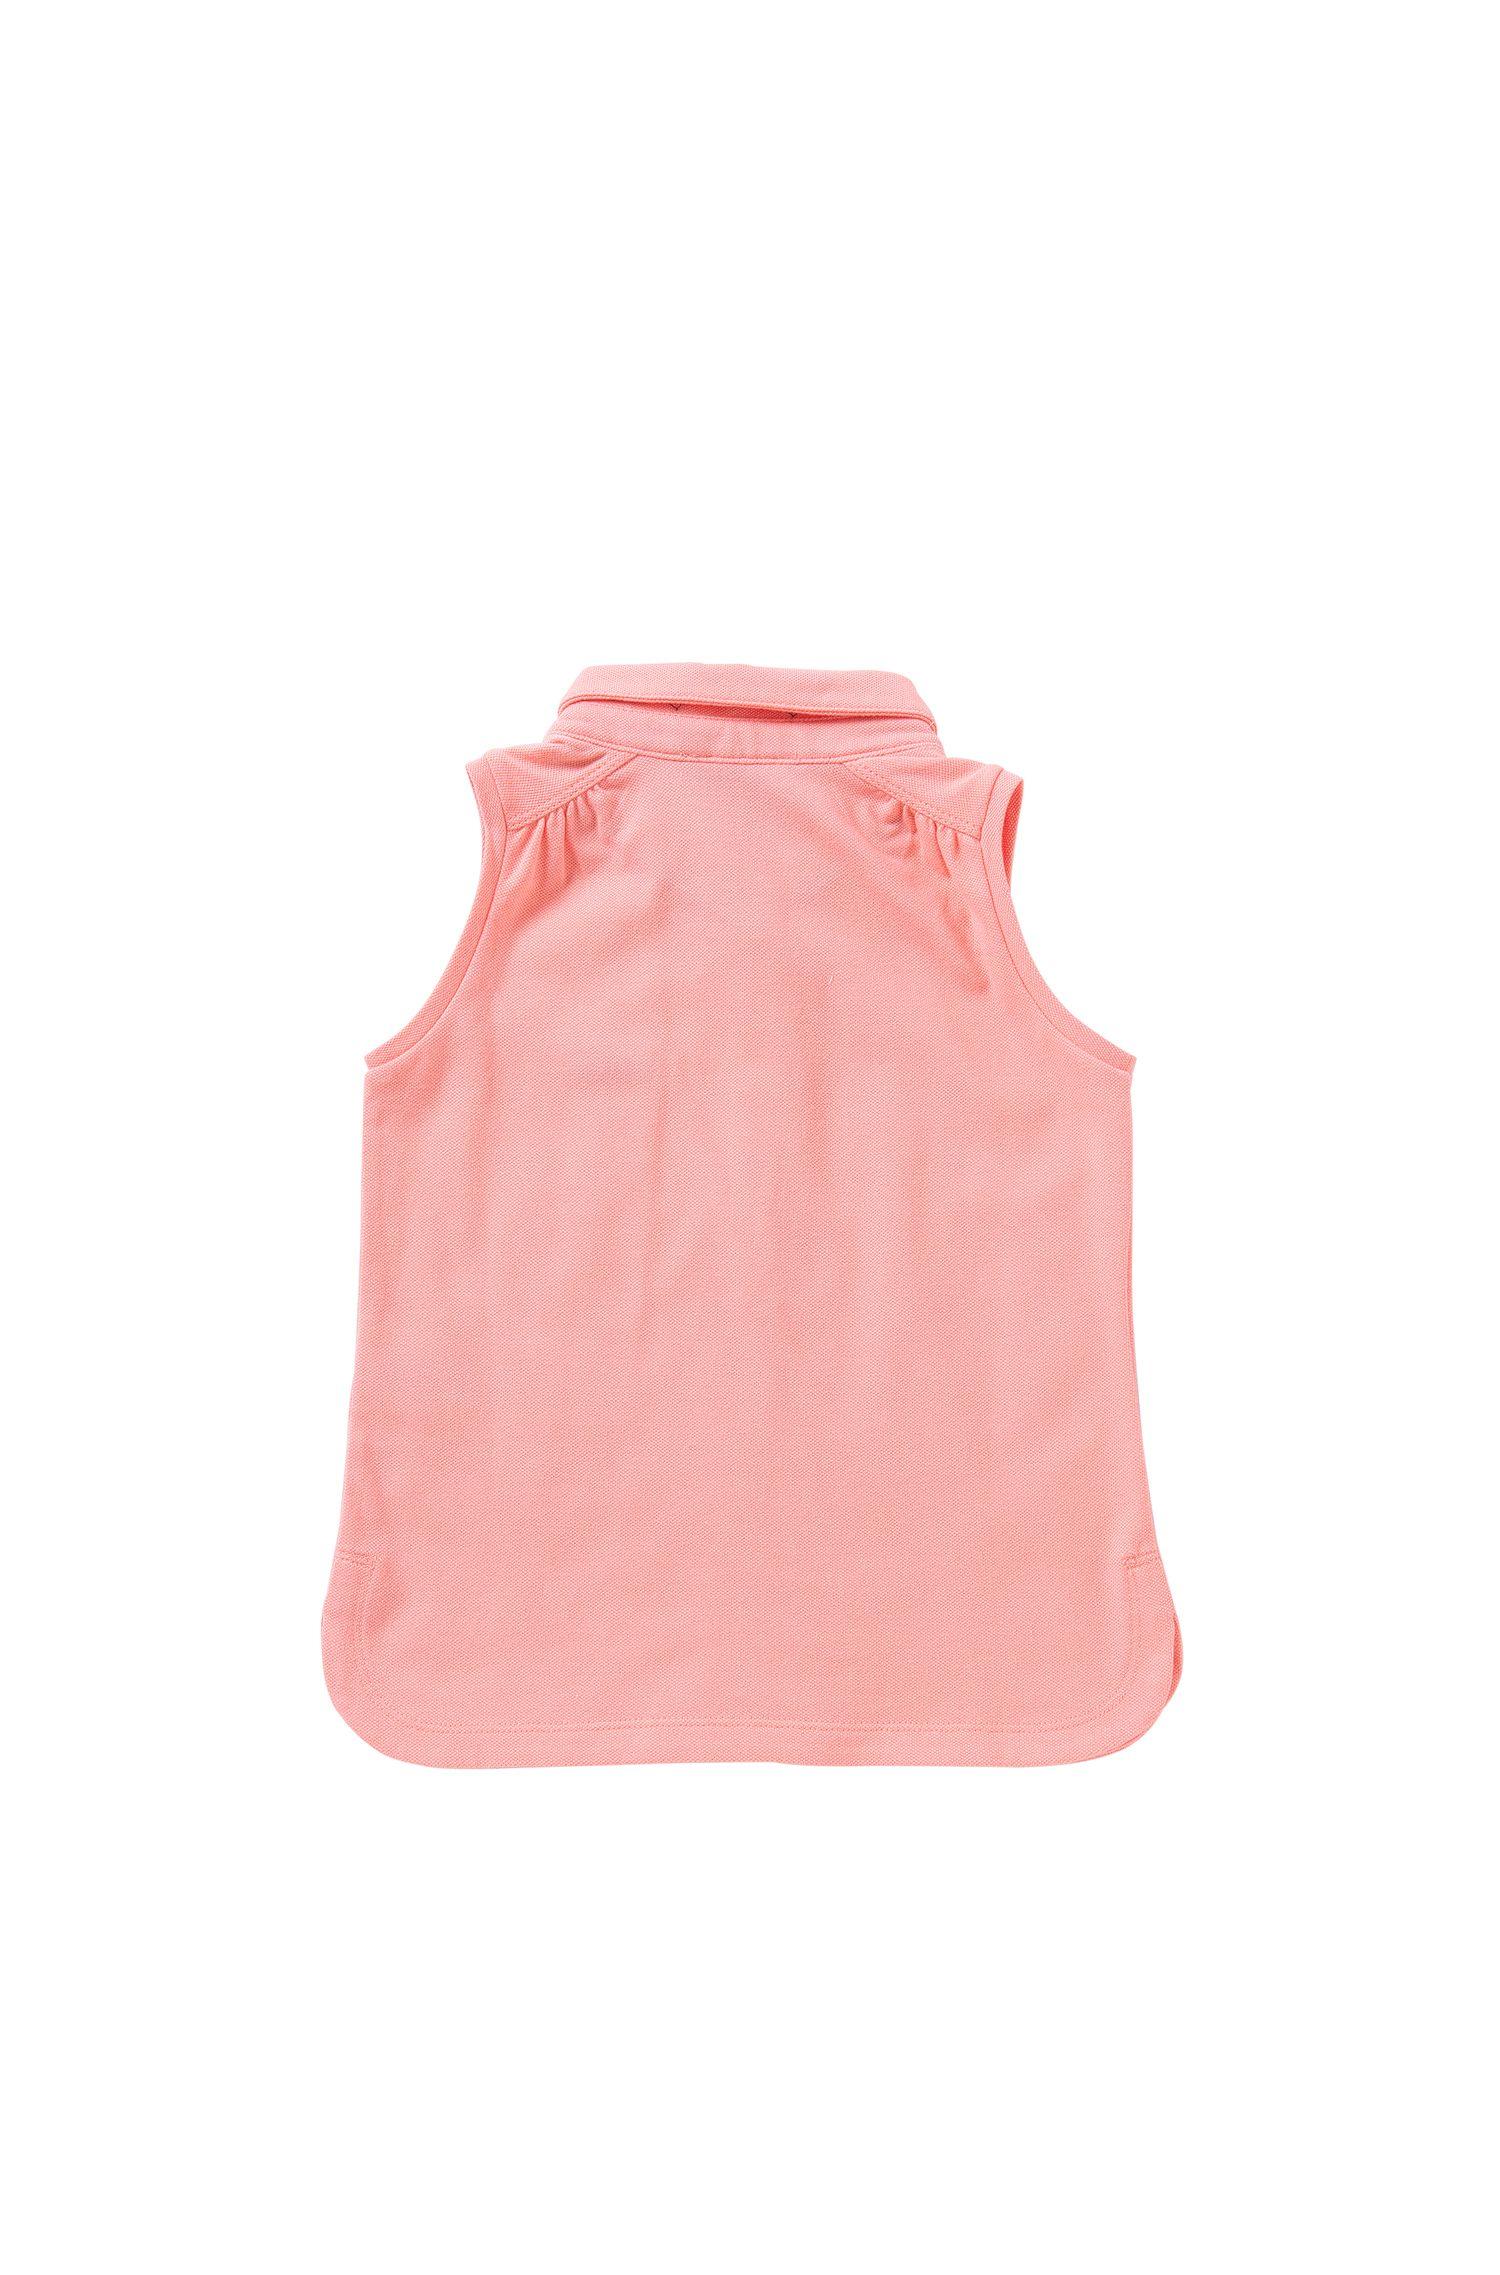 Mouwloos kinderpoloshirt van stretchkatoen: 'J15344'